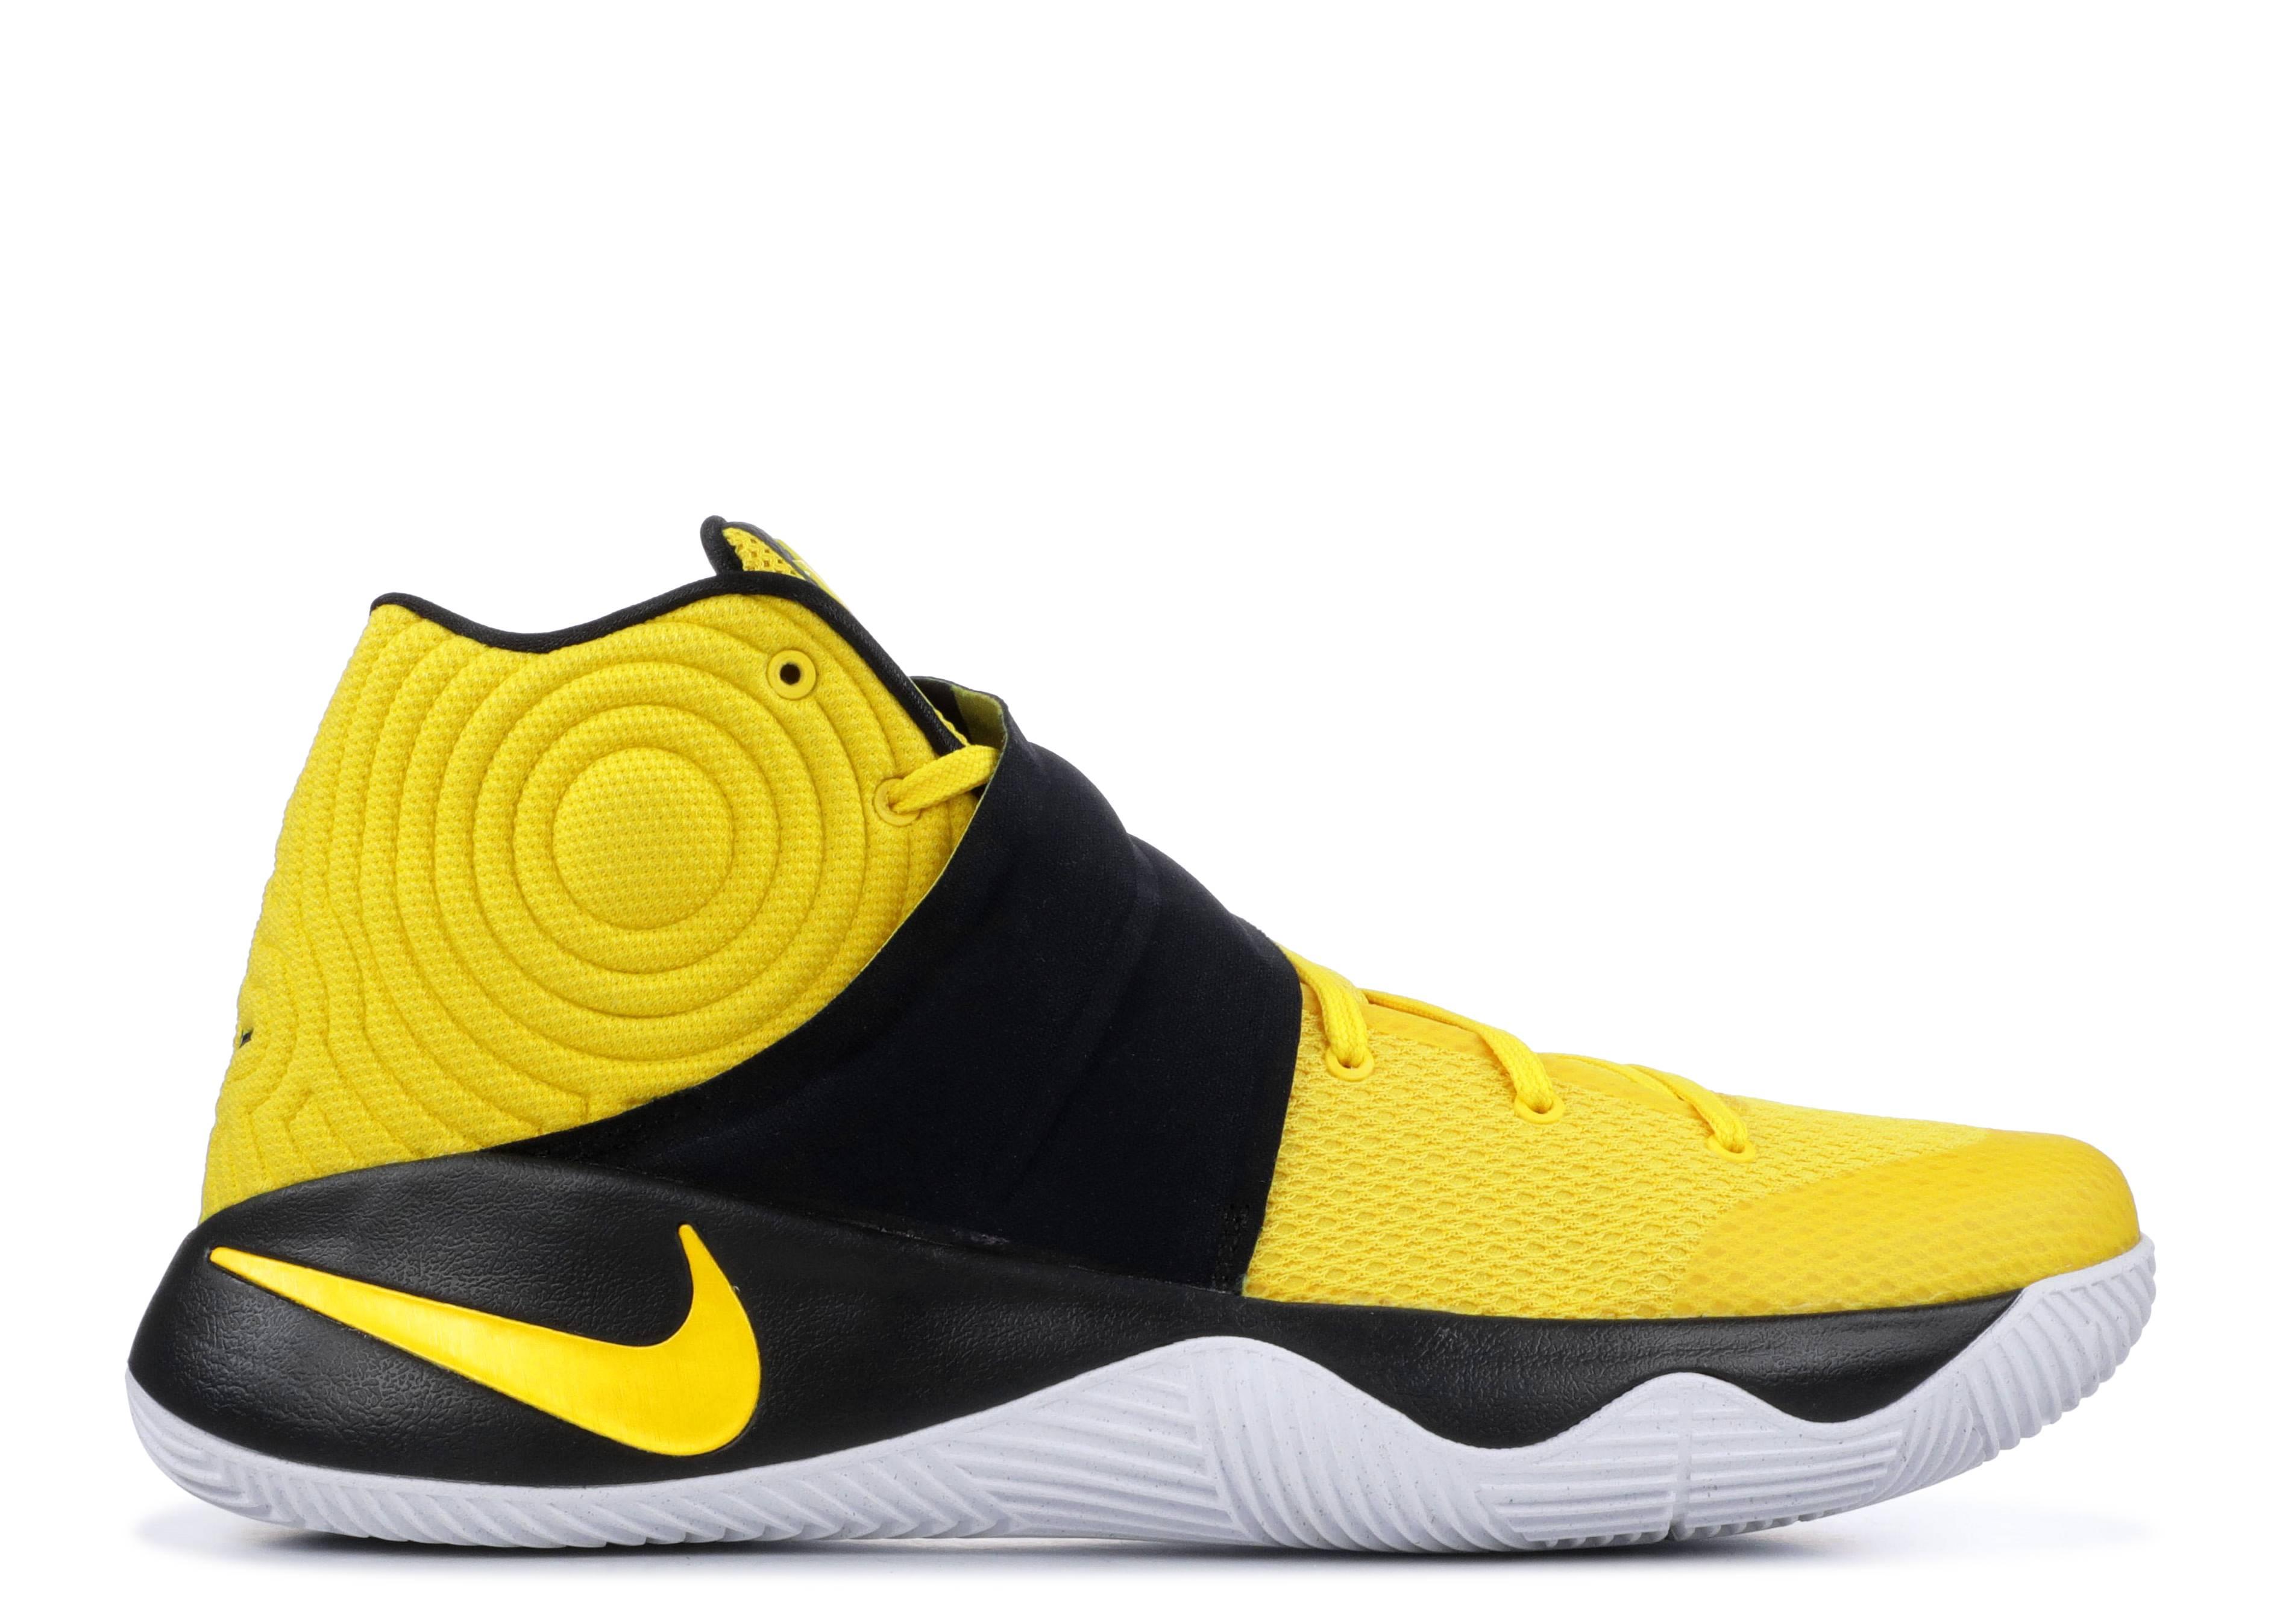 53dd1609320 Kyrie Irving - Nike Basketball - Nike